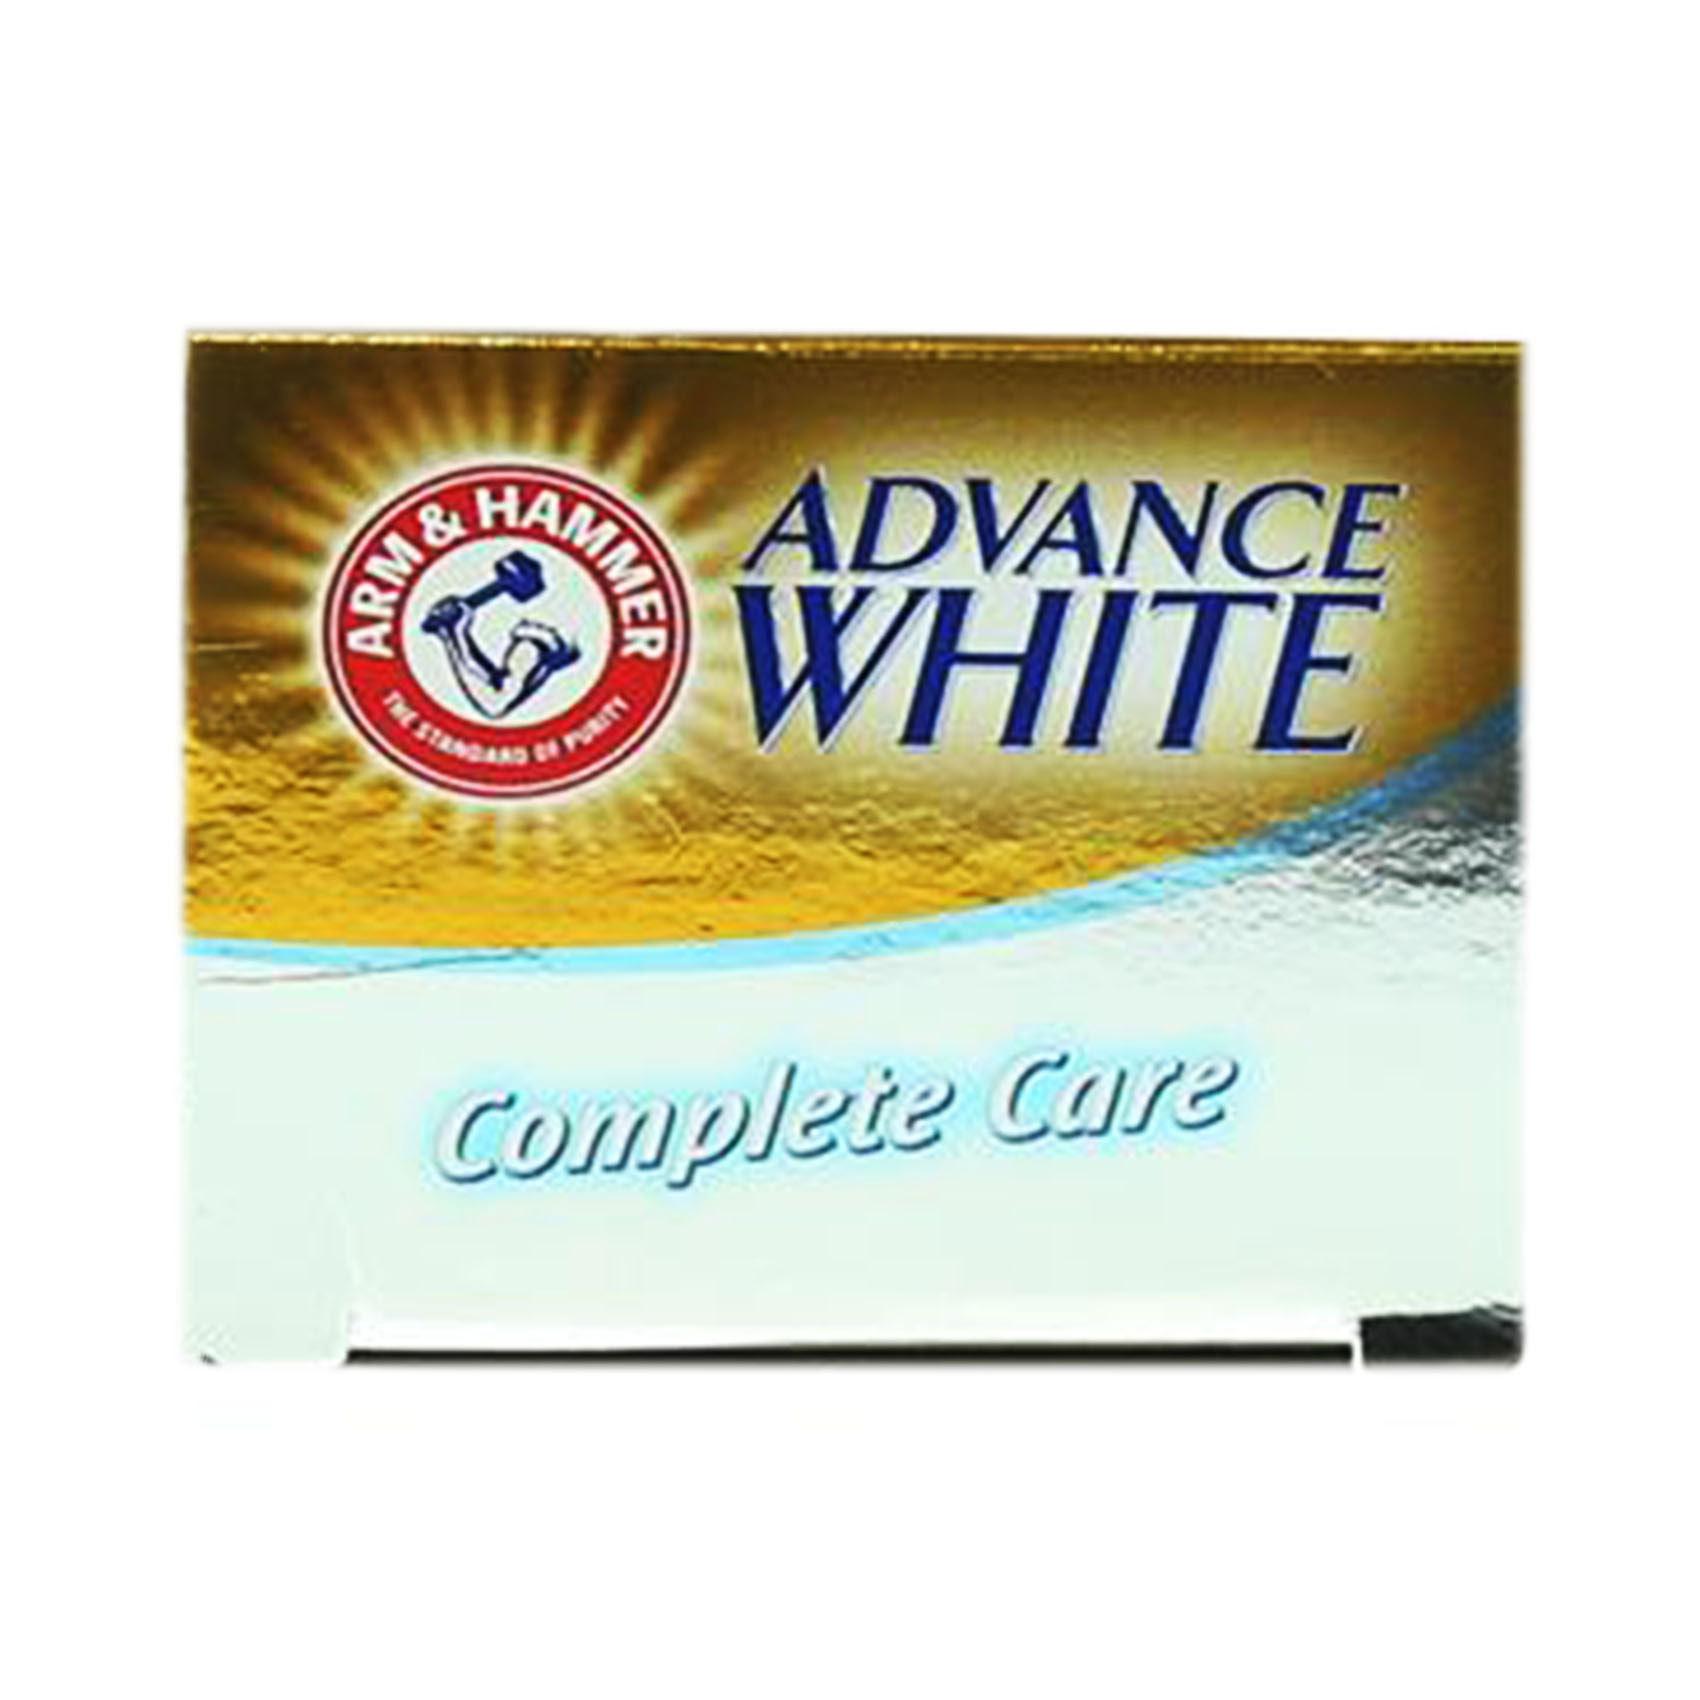 ARM&HAMMER ADV WHITE COMPLT CARE T